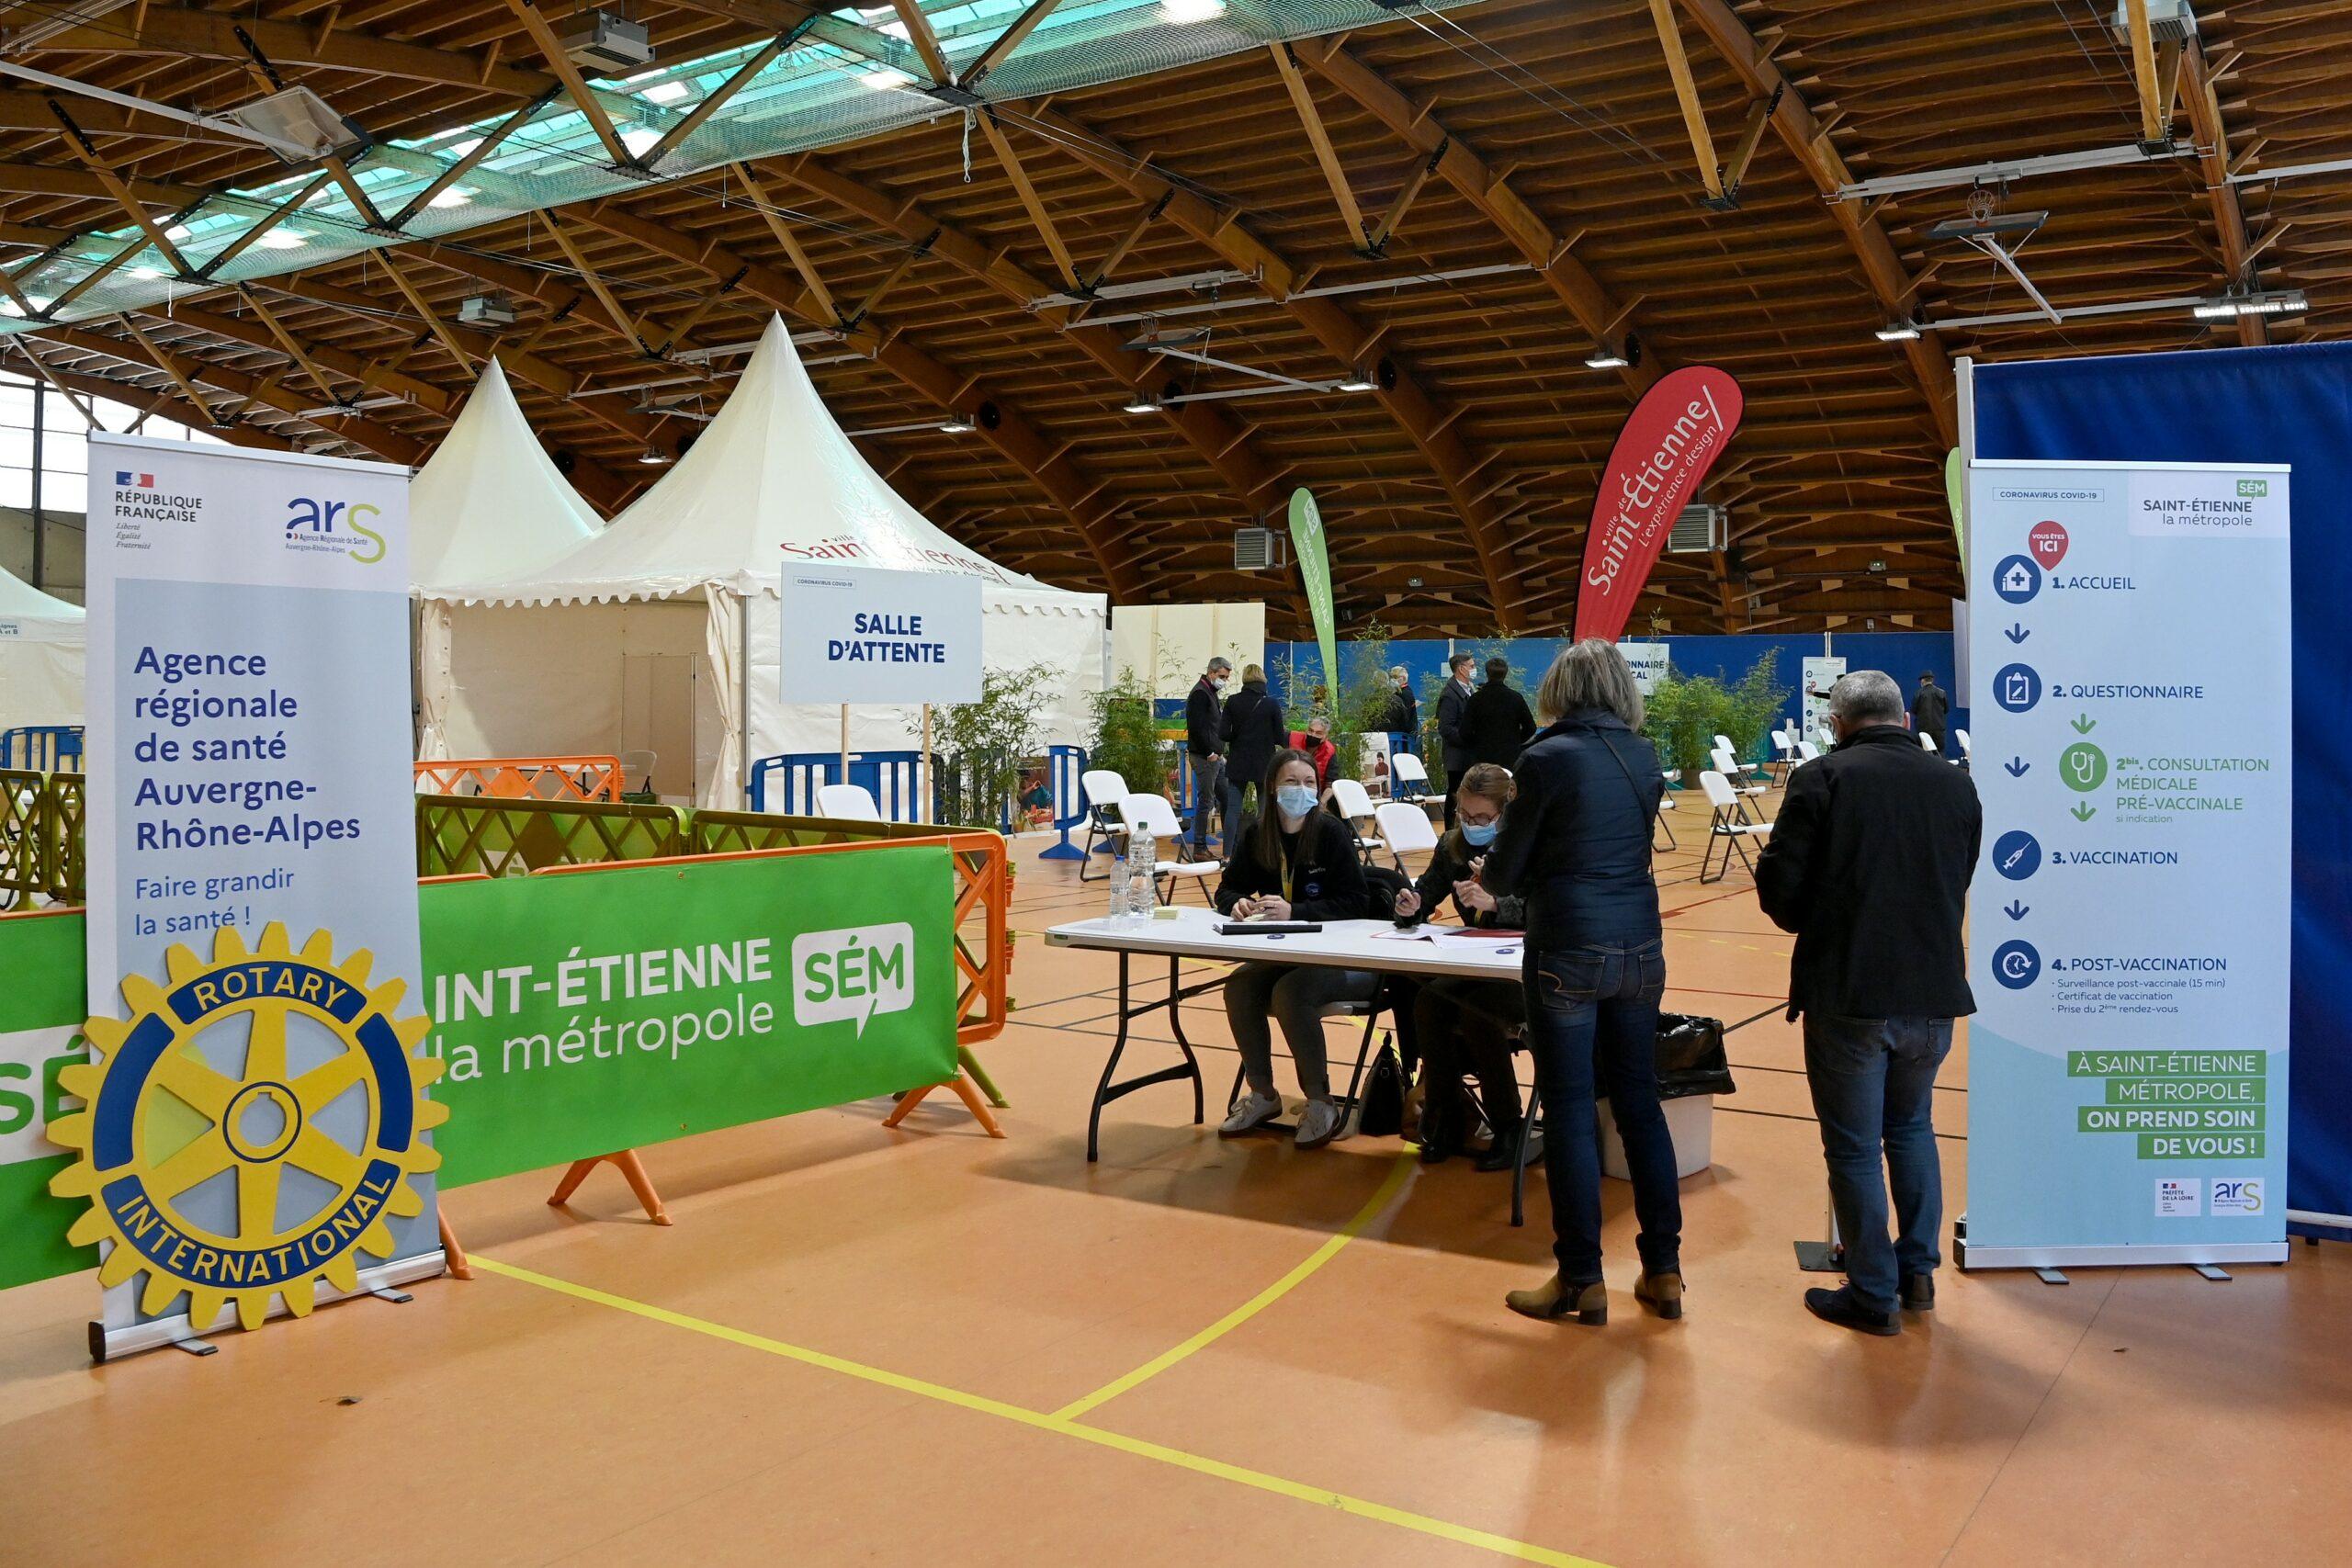 Vaccination Salle Omnisports de Saint-Étienne